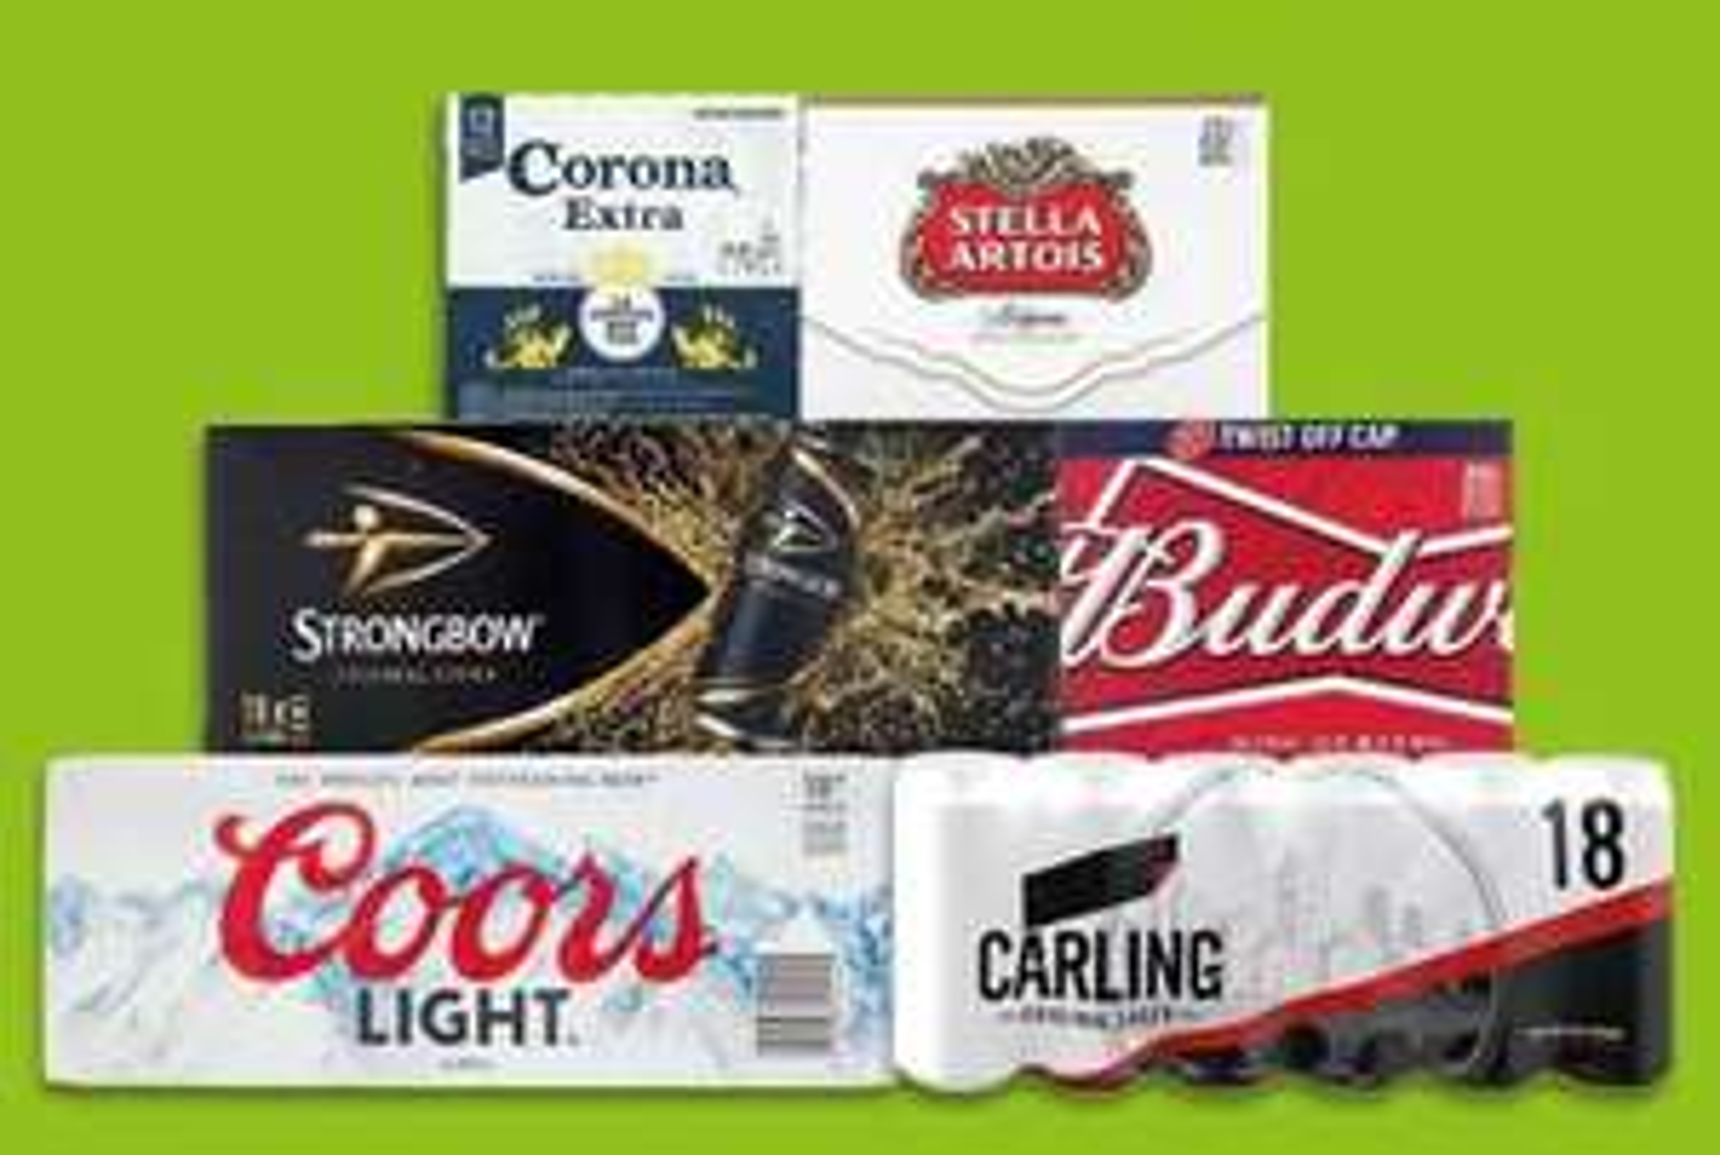 £10 beer & ciders - 18 x 440ml Coors Light, Strongbow & Carling, 20 x 330ml Budweiser, 20 x 284ml Stella & 12 x 330ml Corona @ Morrisons